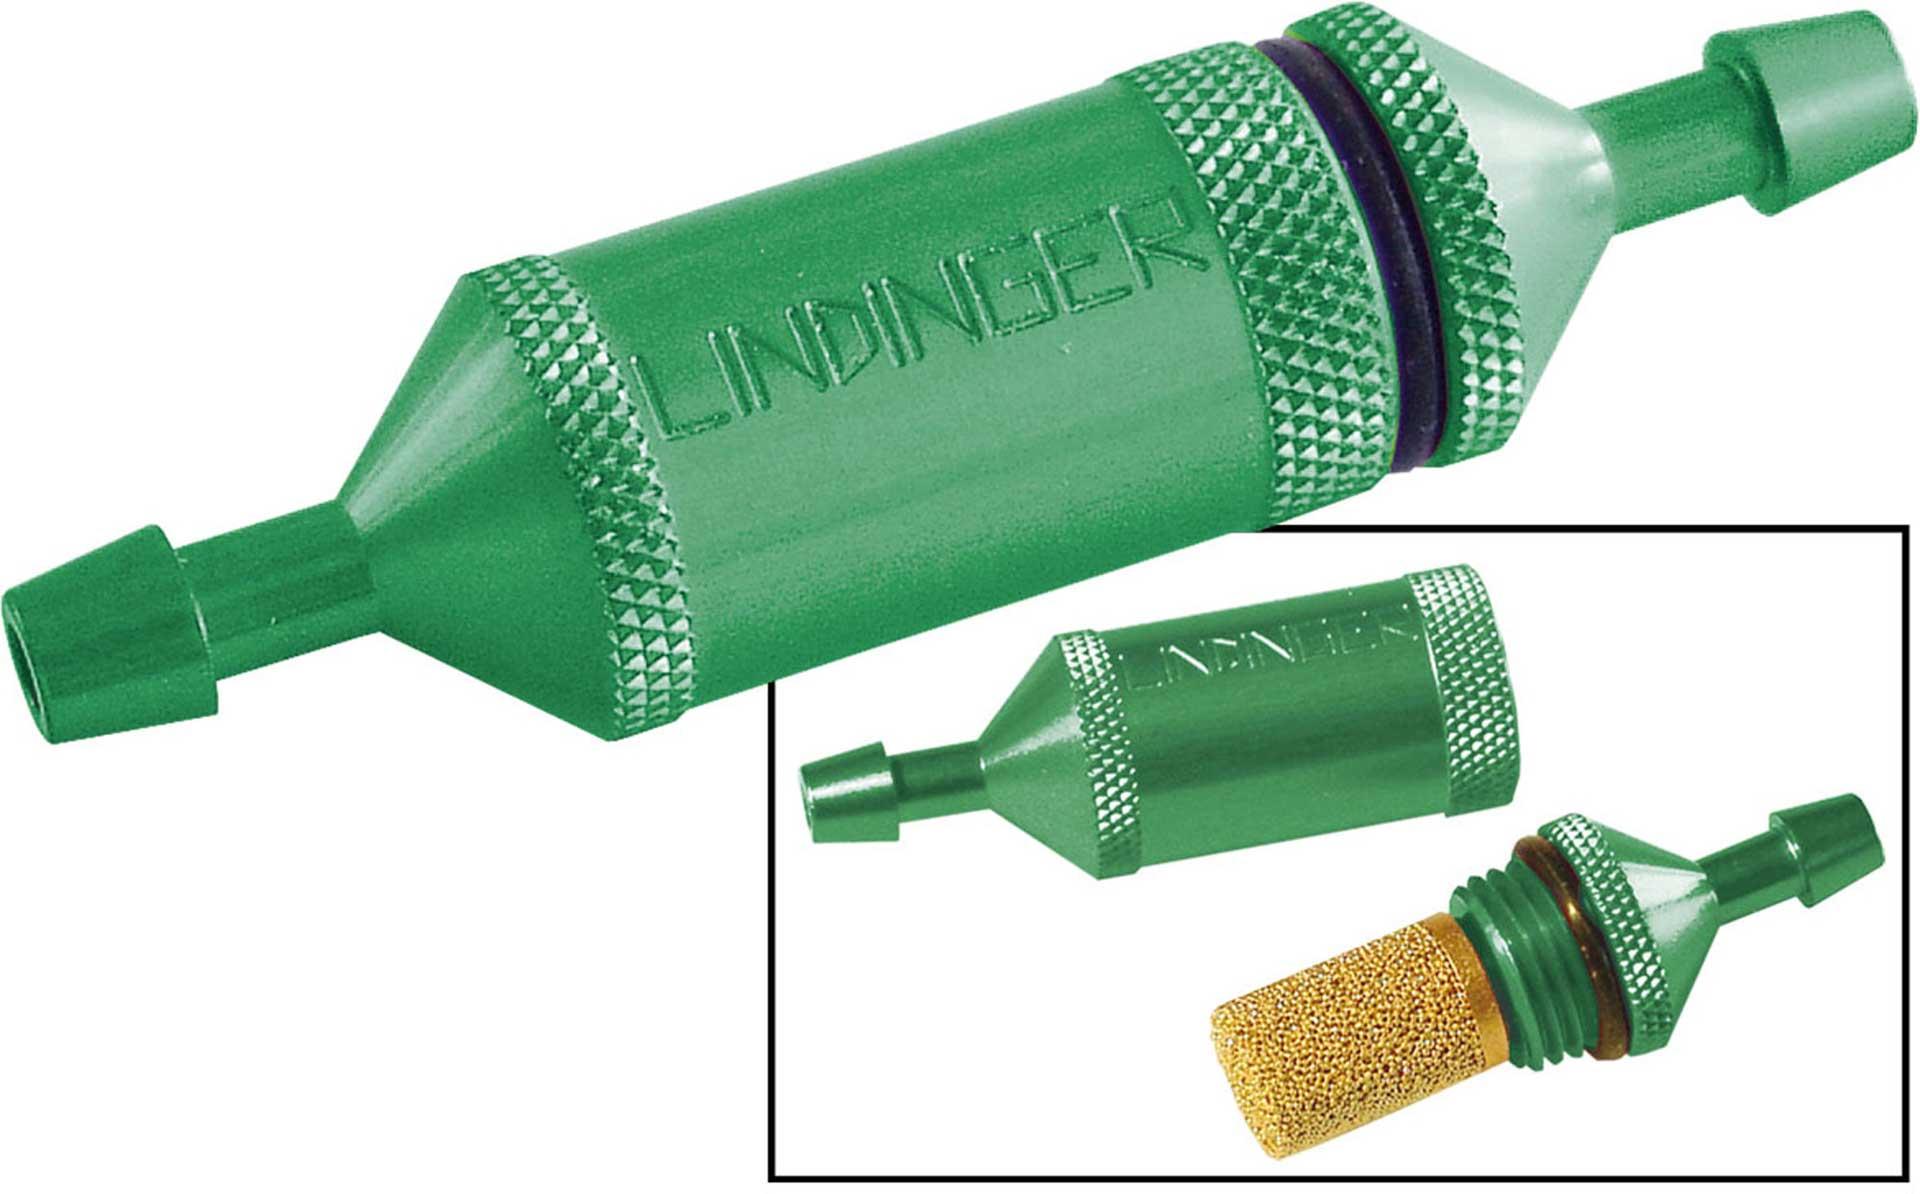 PLANET-HOBBY FUEL FILTER LINDINGER PROFI WITH SINTERED METAL INSERT